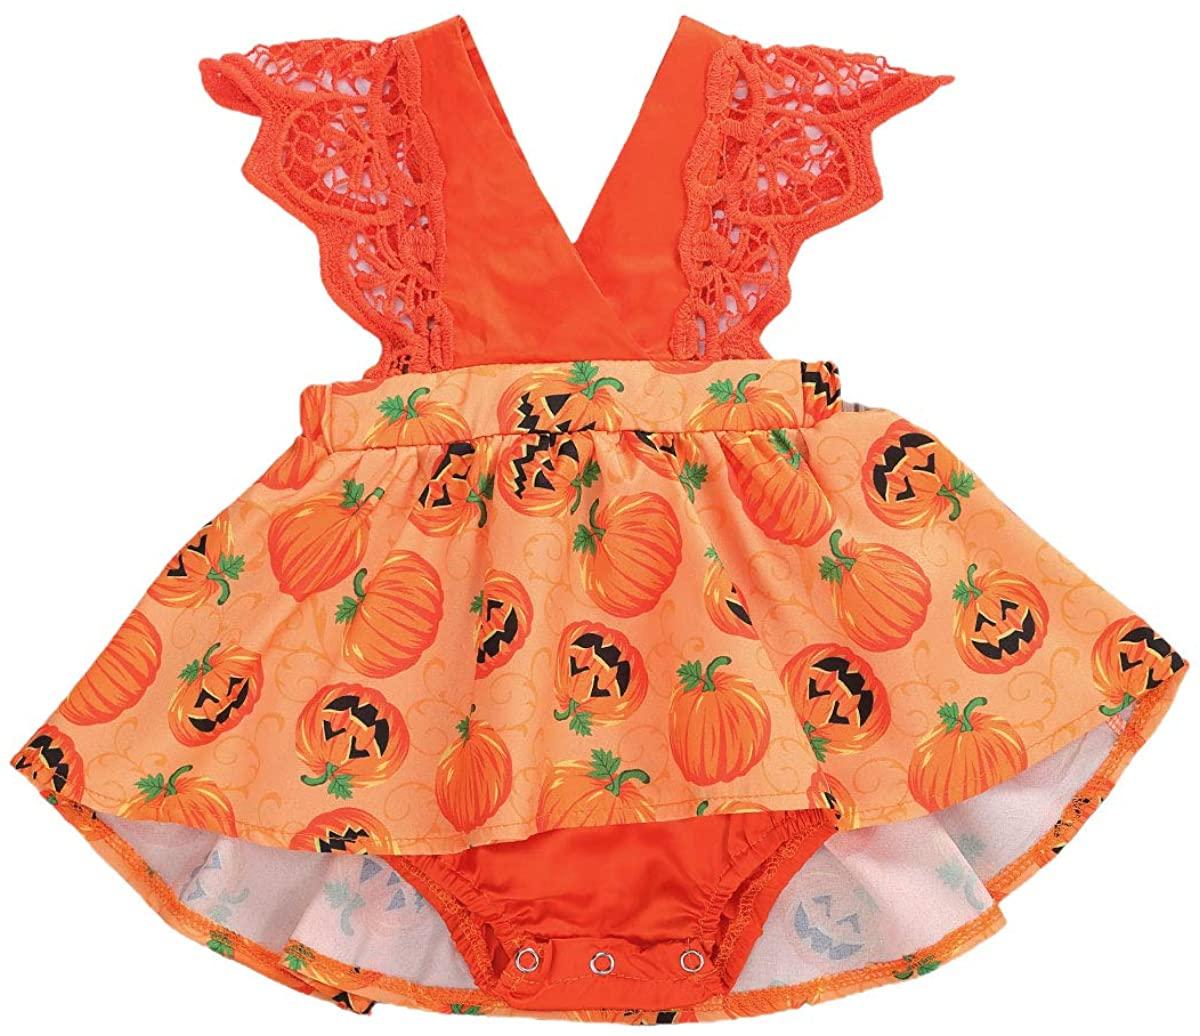 Toddler Baby Girls My First Halloween Clothes V-Neck Sleeveless Romper Top Pumpkin Floral Tutu Skirt 2Pcs Outfits Set